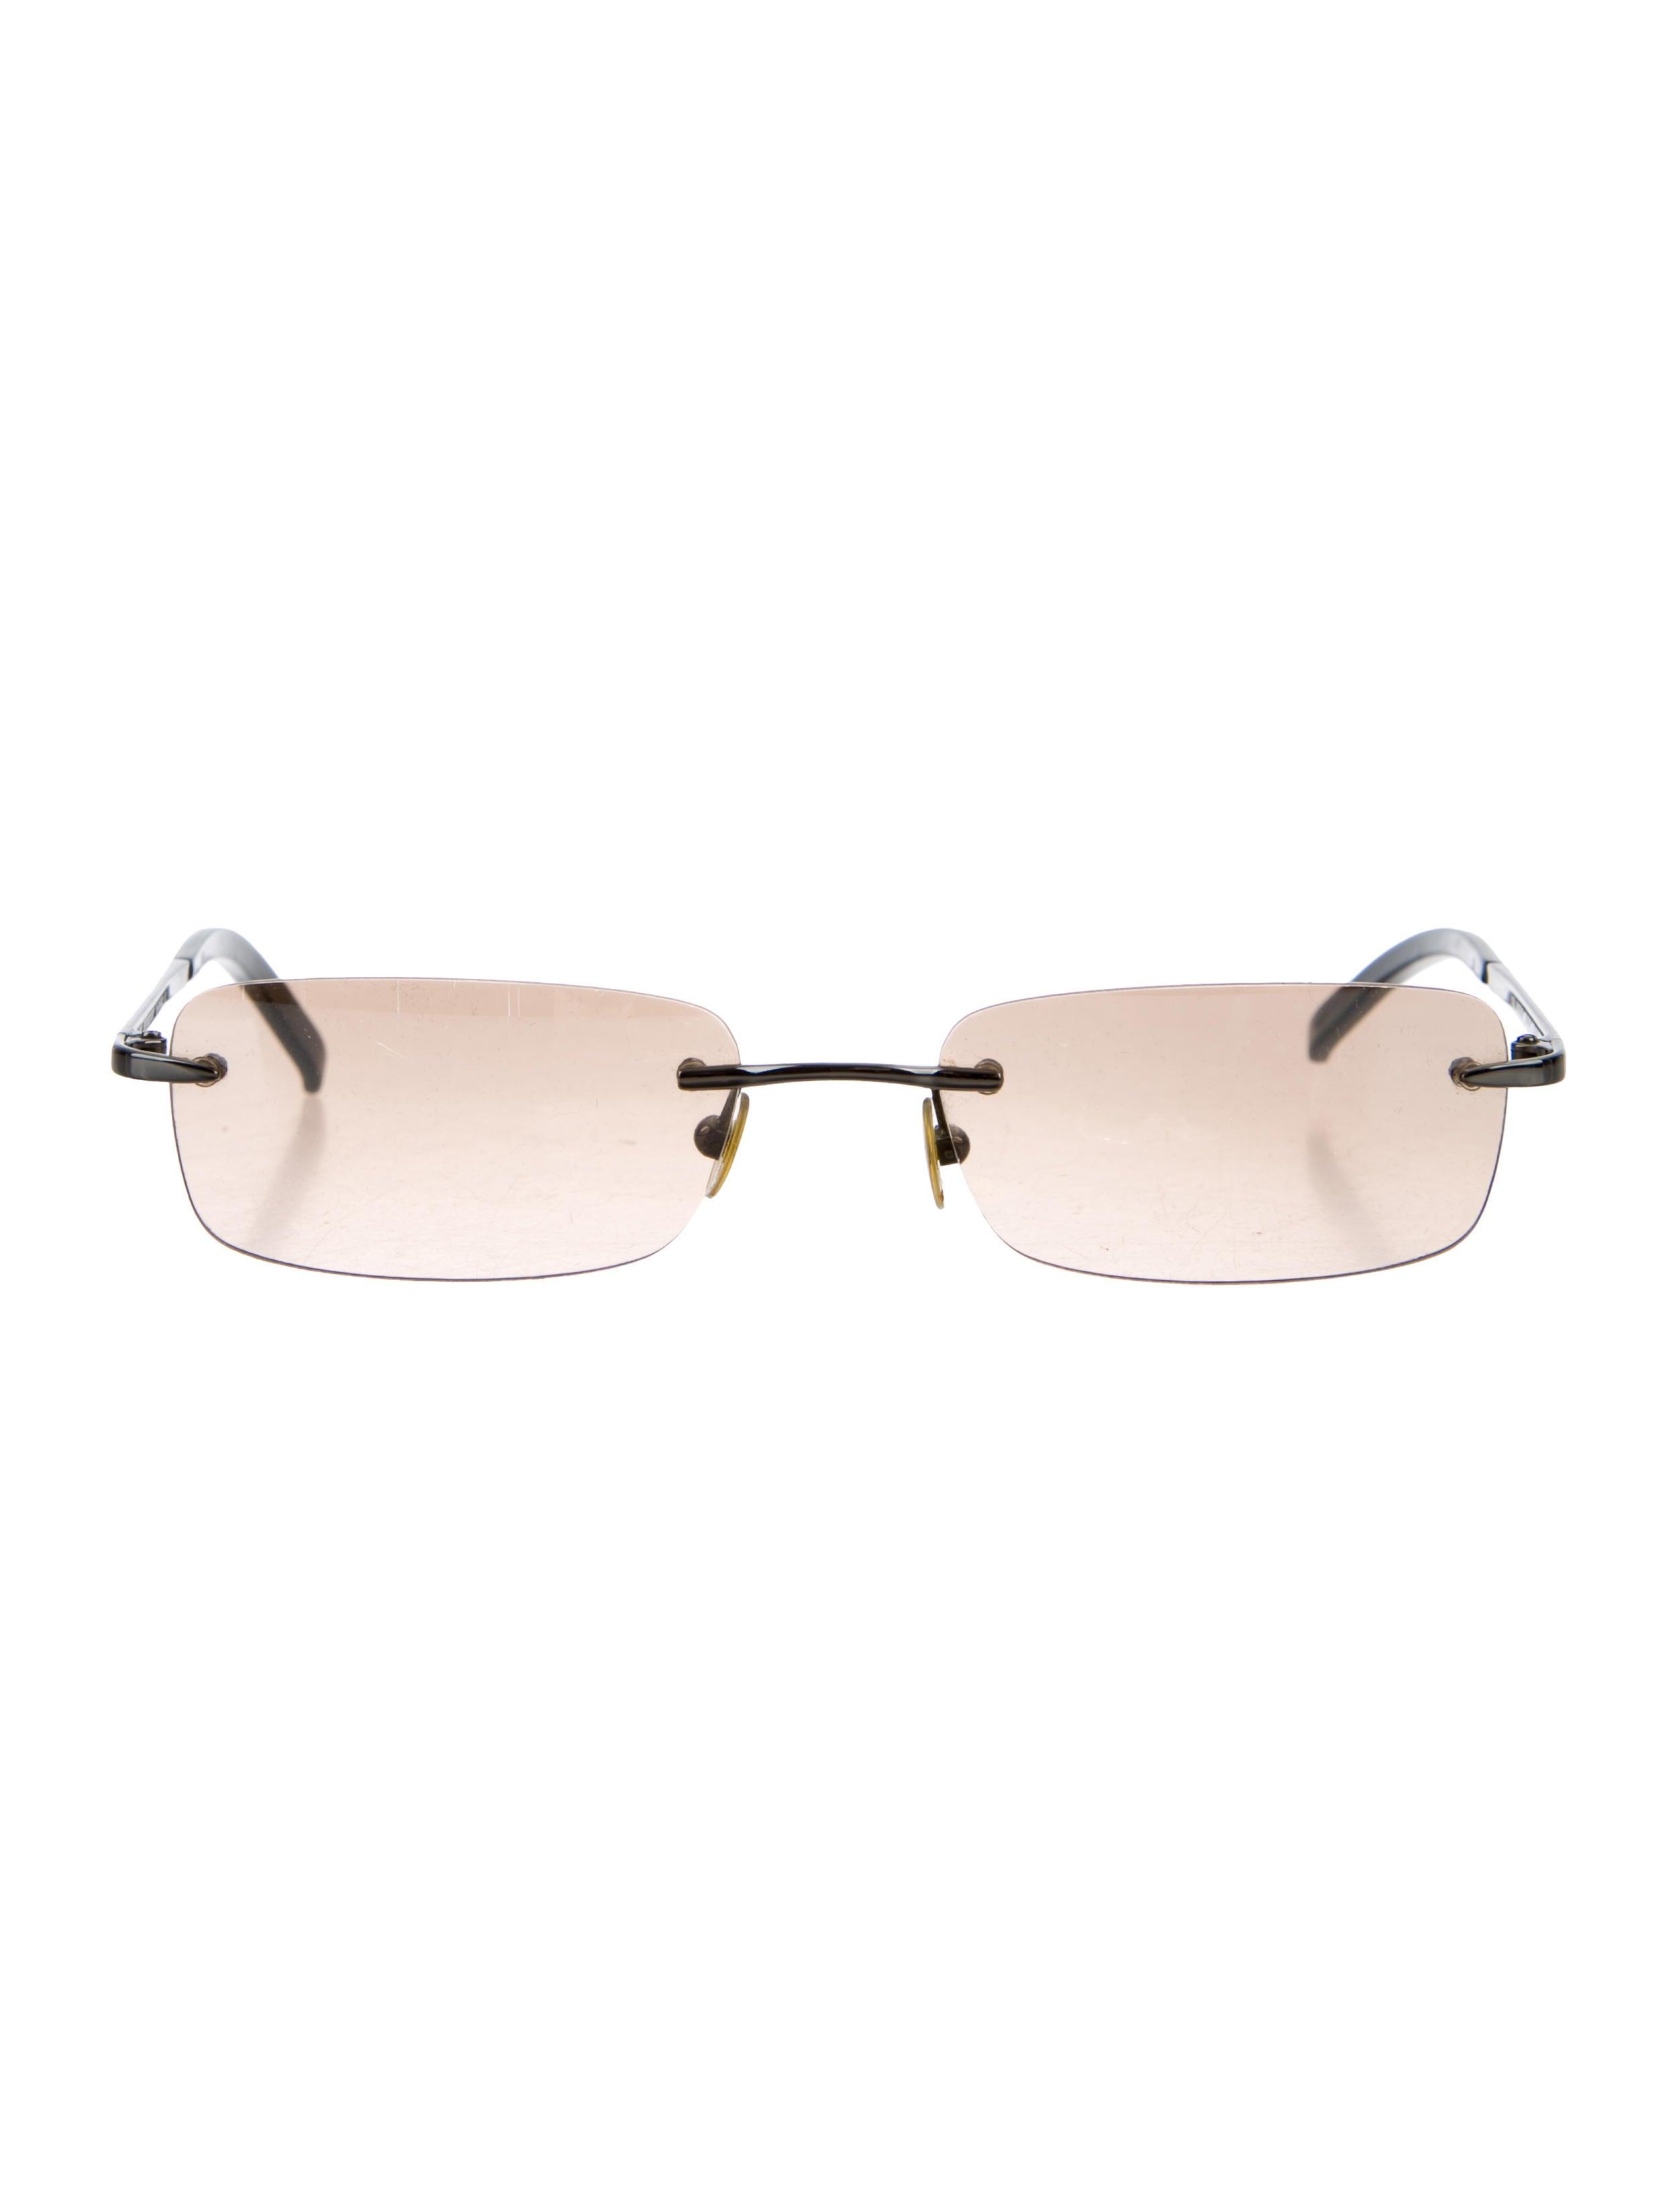 Burberry Rimless Glasses : Burberry Rimless Rectangular Sunglasses - Accessories ...